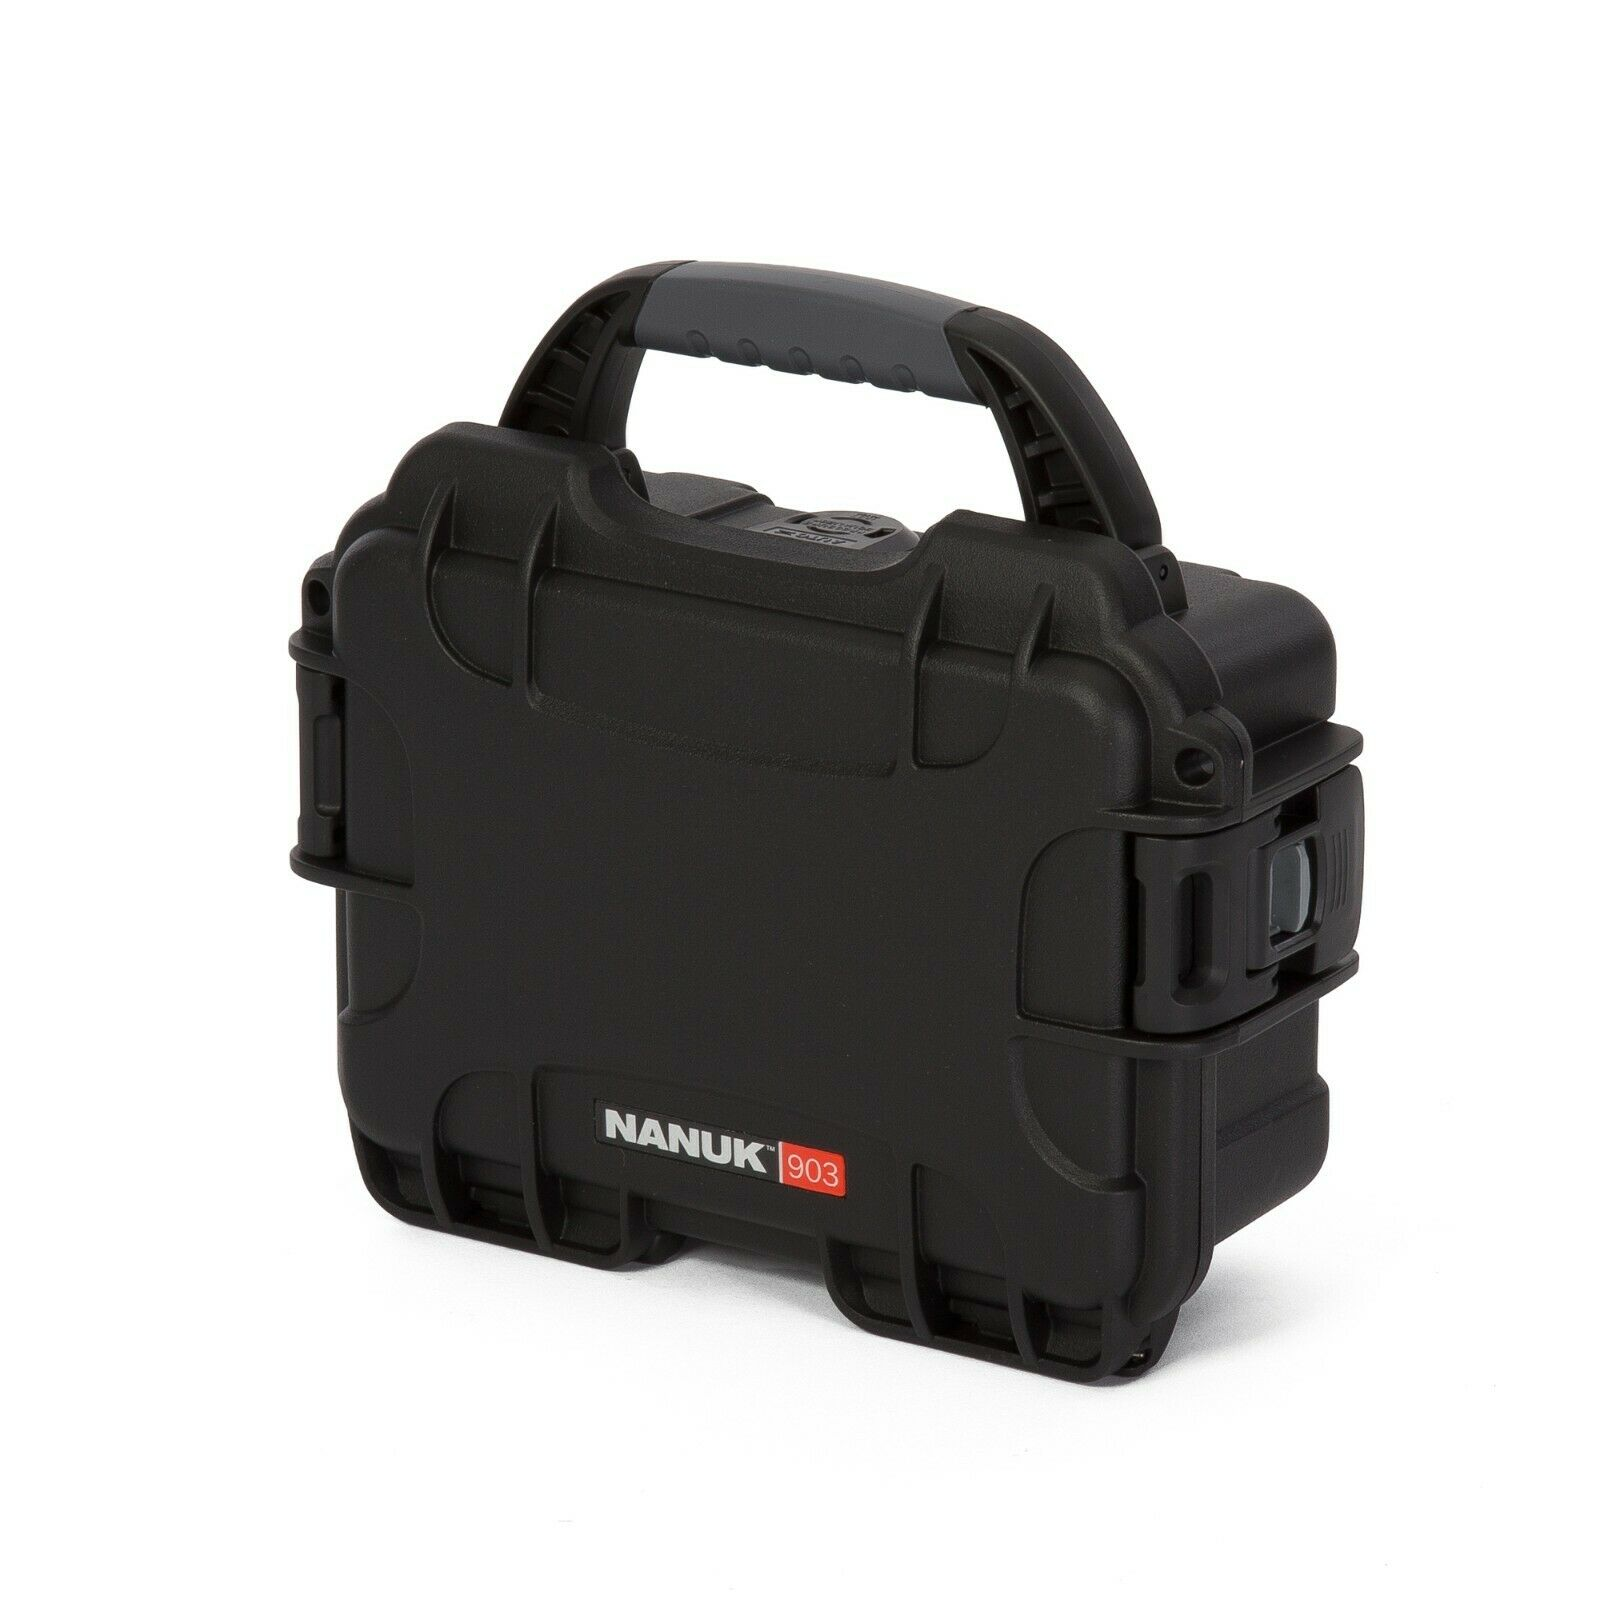 Nanuk 903 NO FOAM set, waterproof IP67,dustproof IP6X,Lightweight,crushproof!